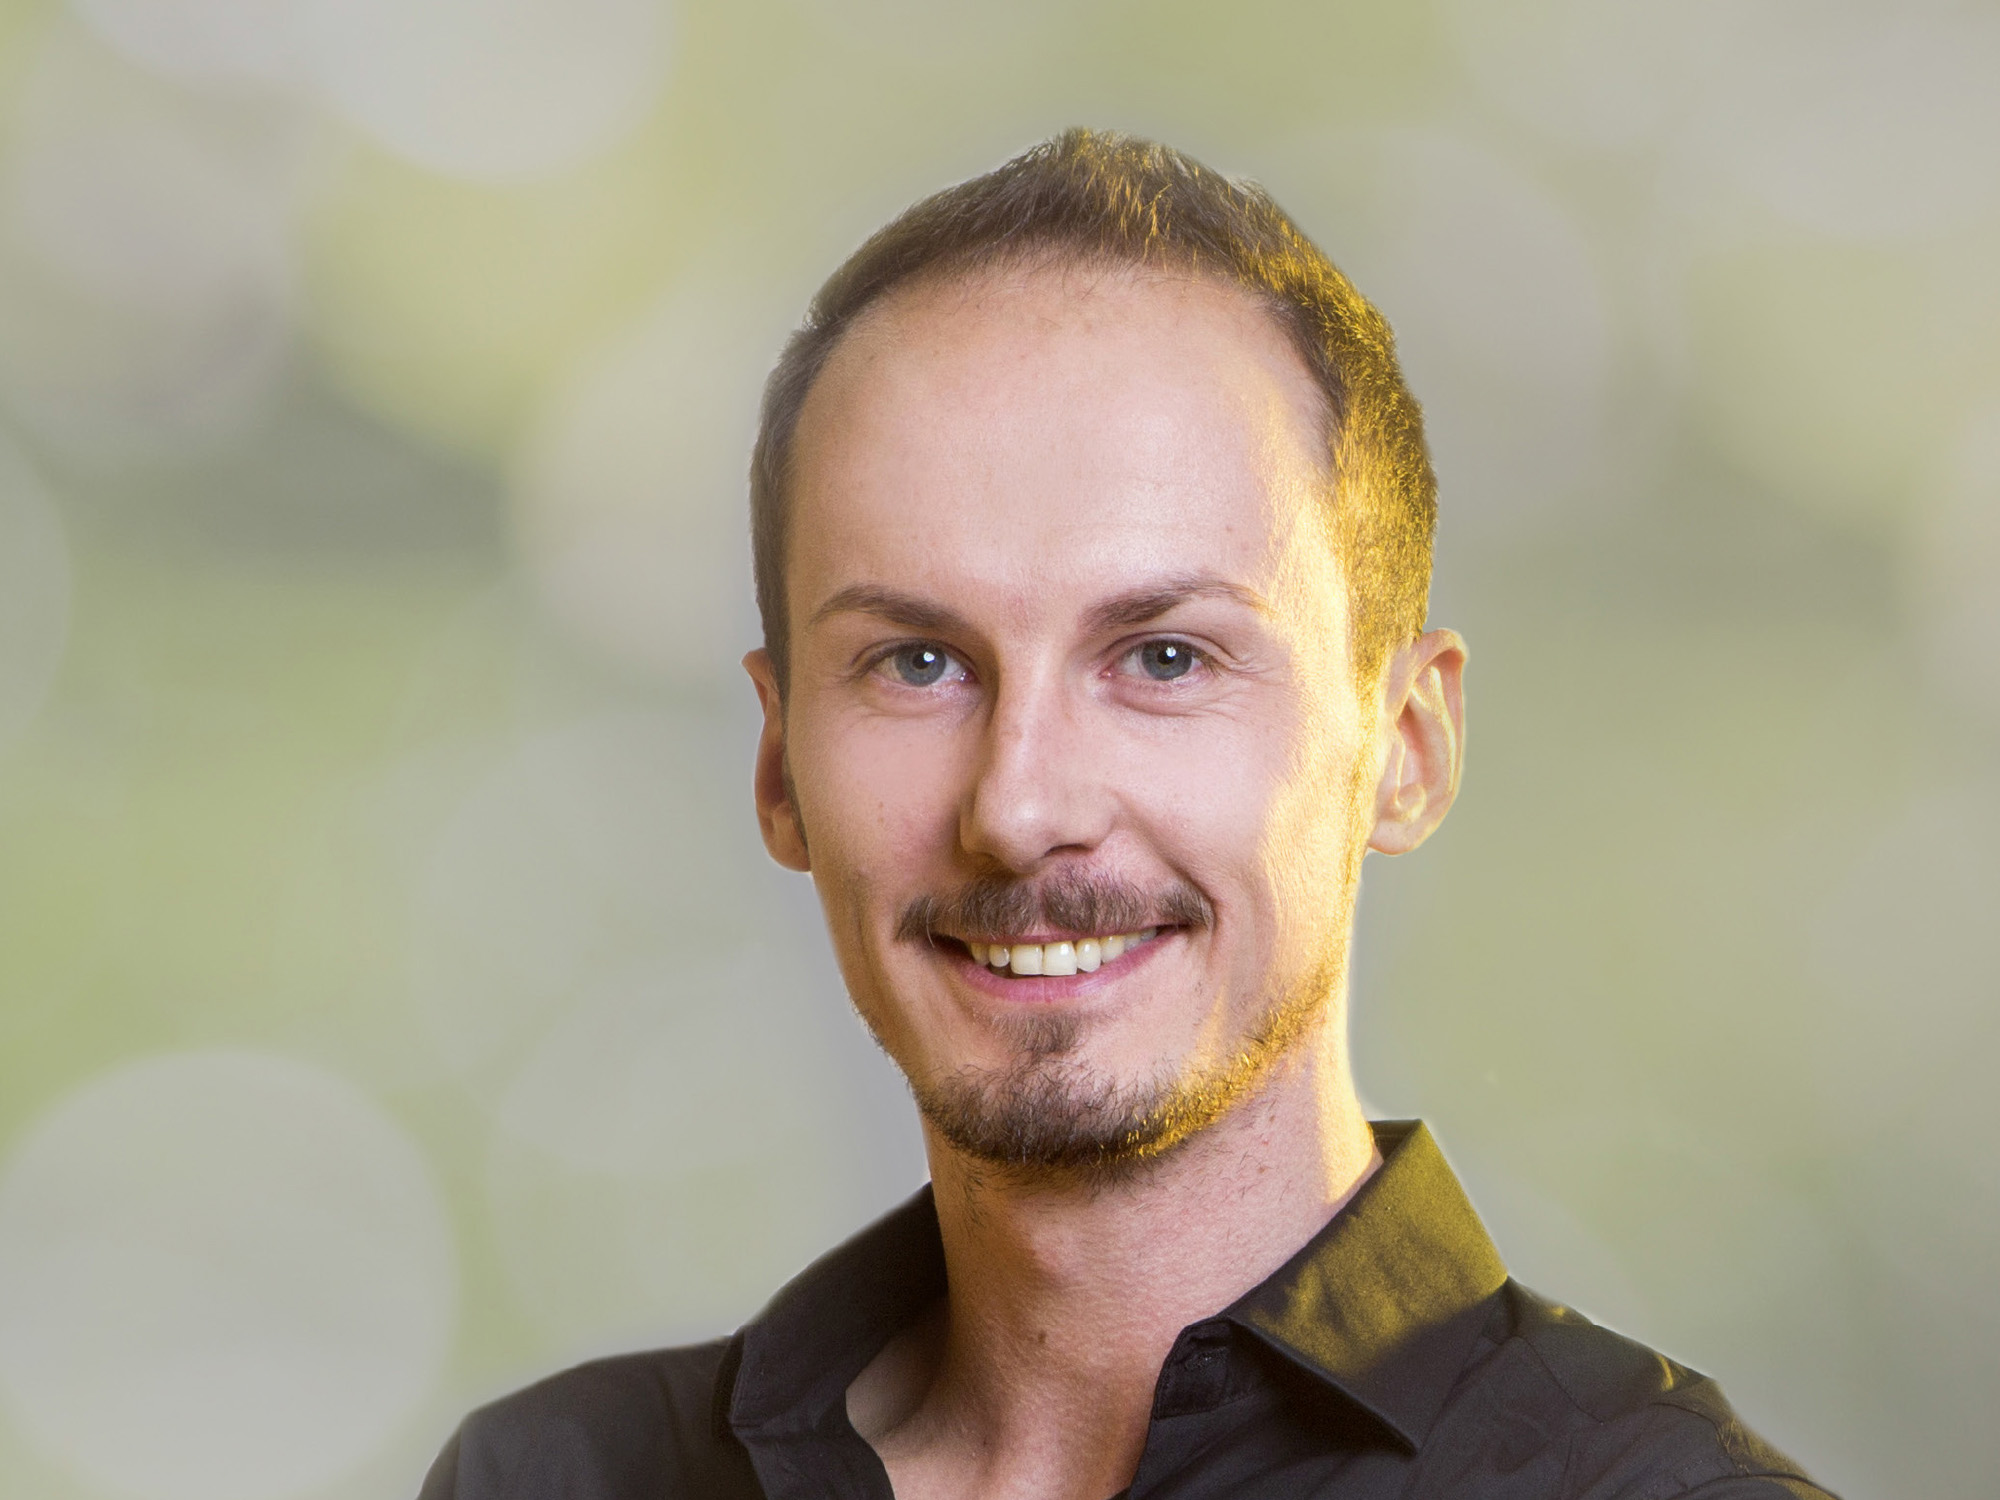 Benito Mangiapane, Topstylist Daniel Schmid Friseur